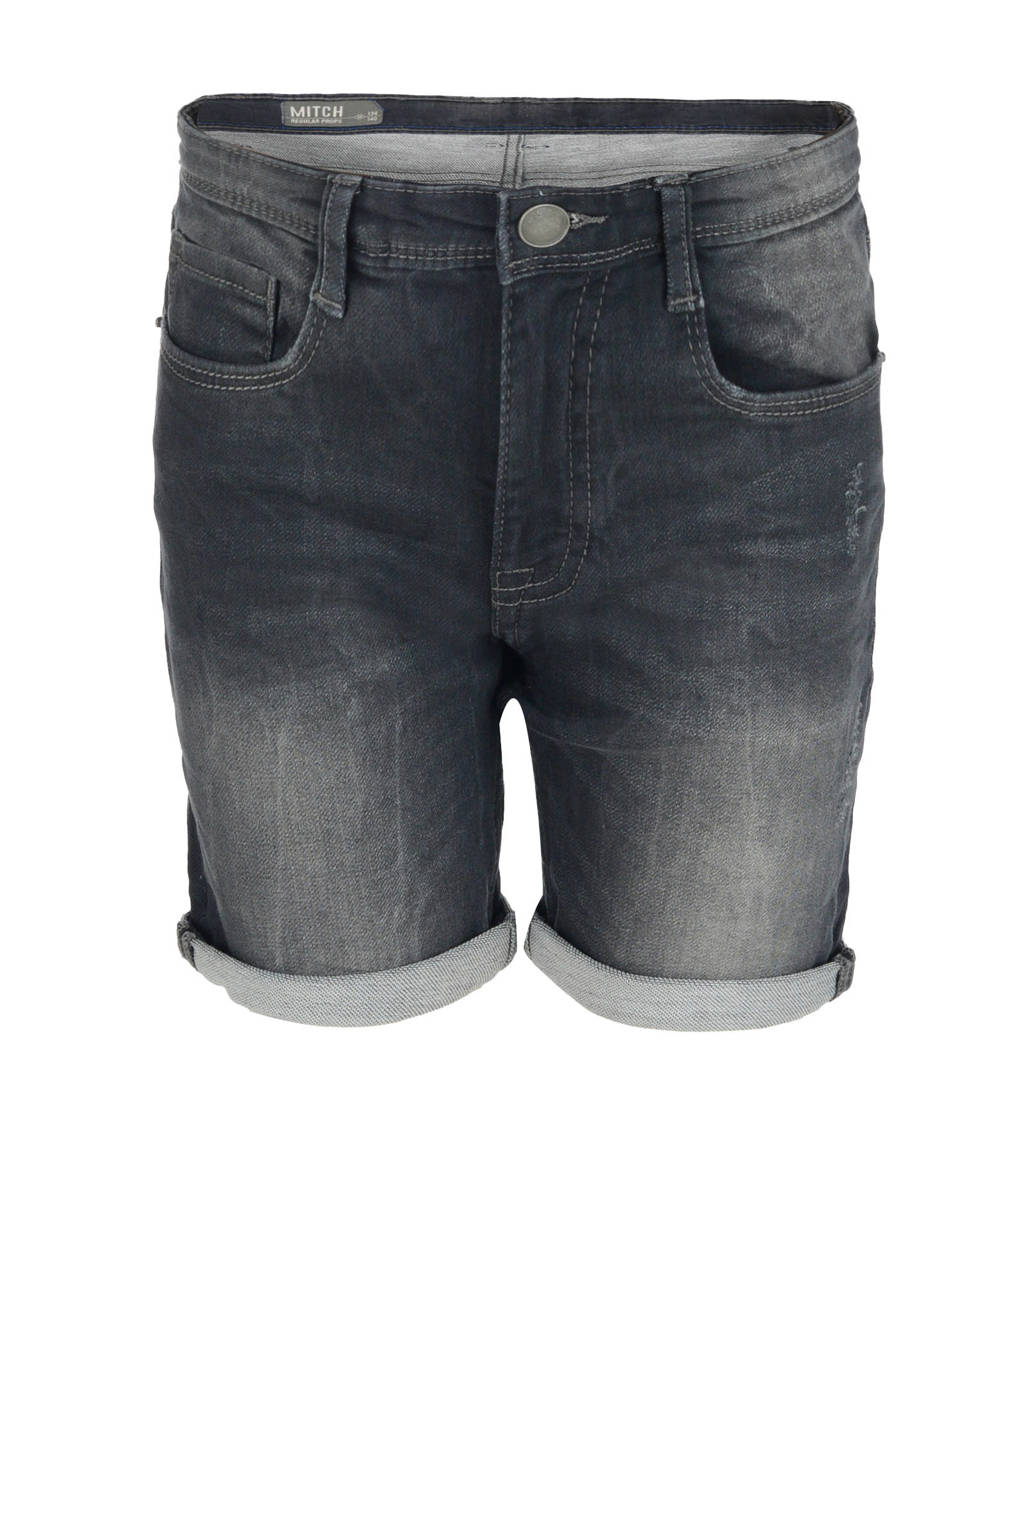 Shoeby Jill & Mitch jeans bermuda Jay grijs stonewashed, Grijs stonewashed